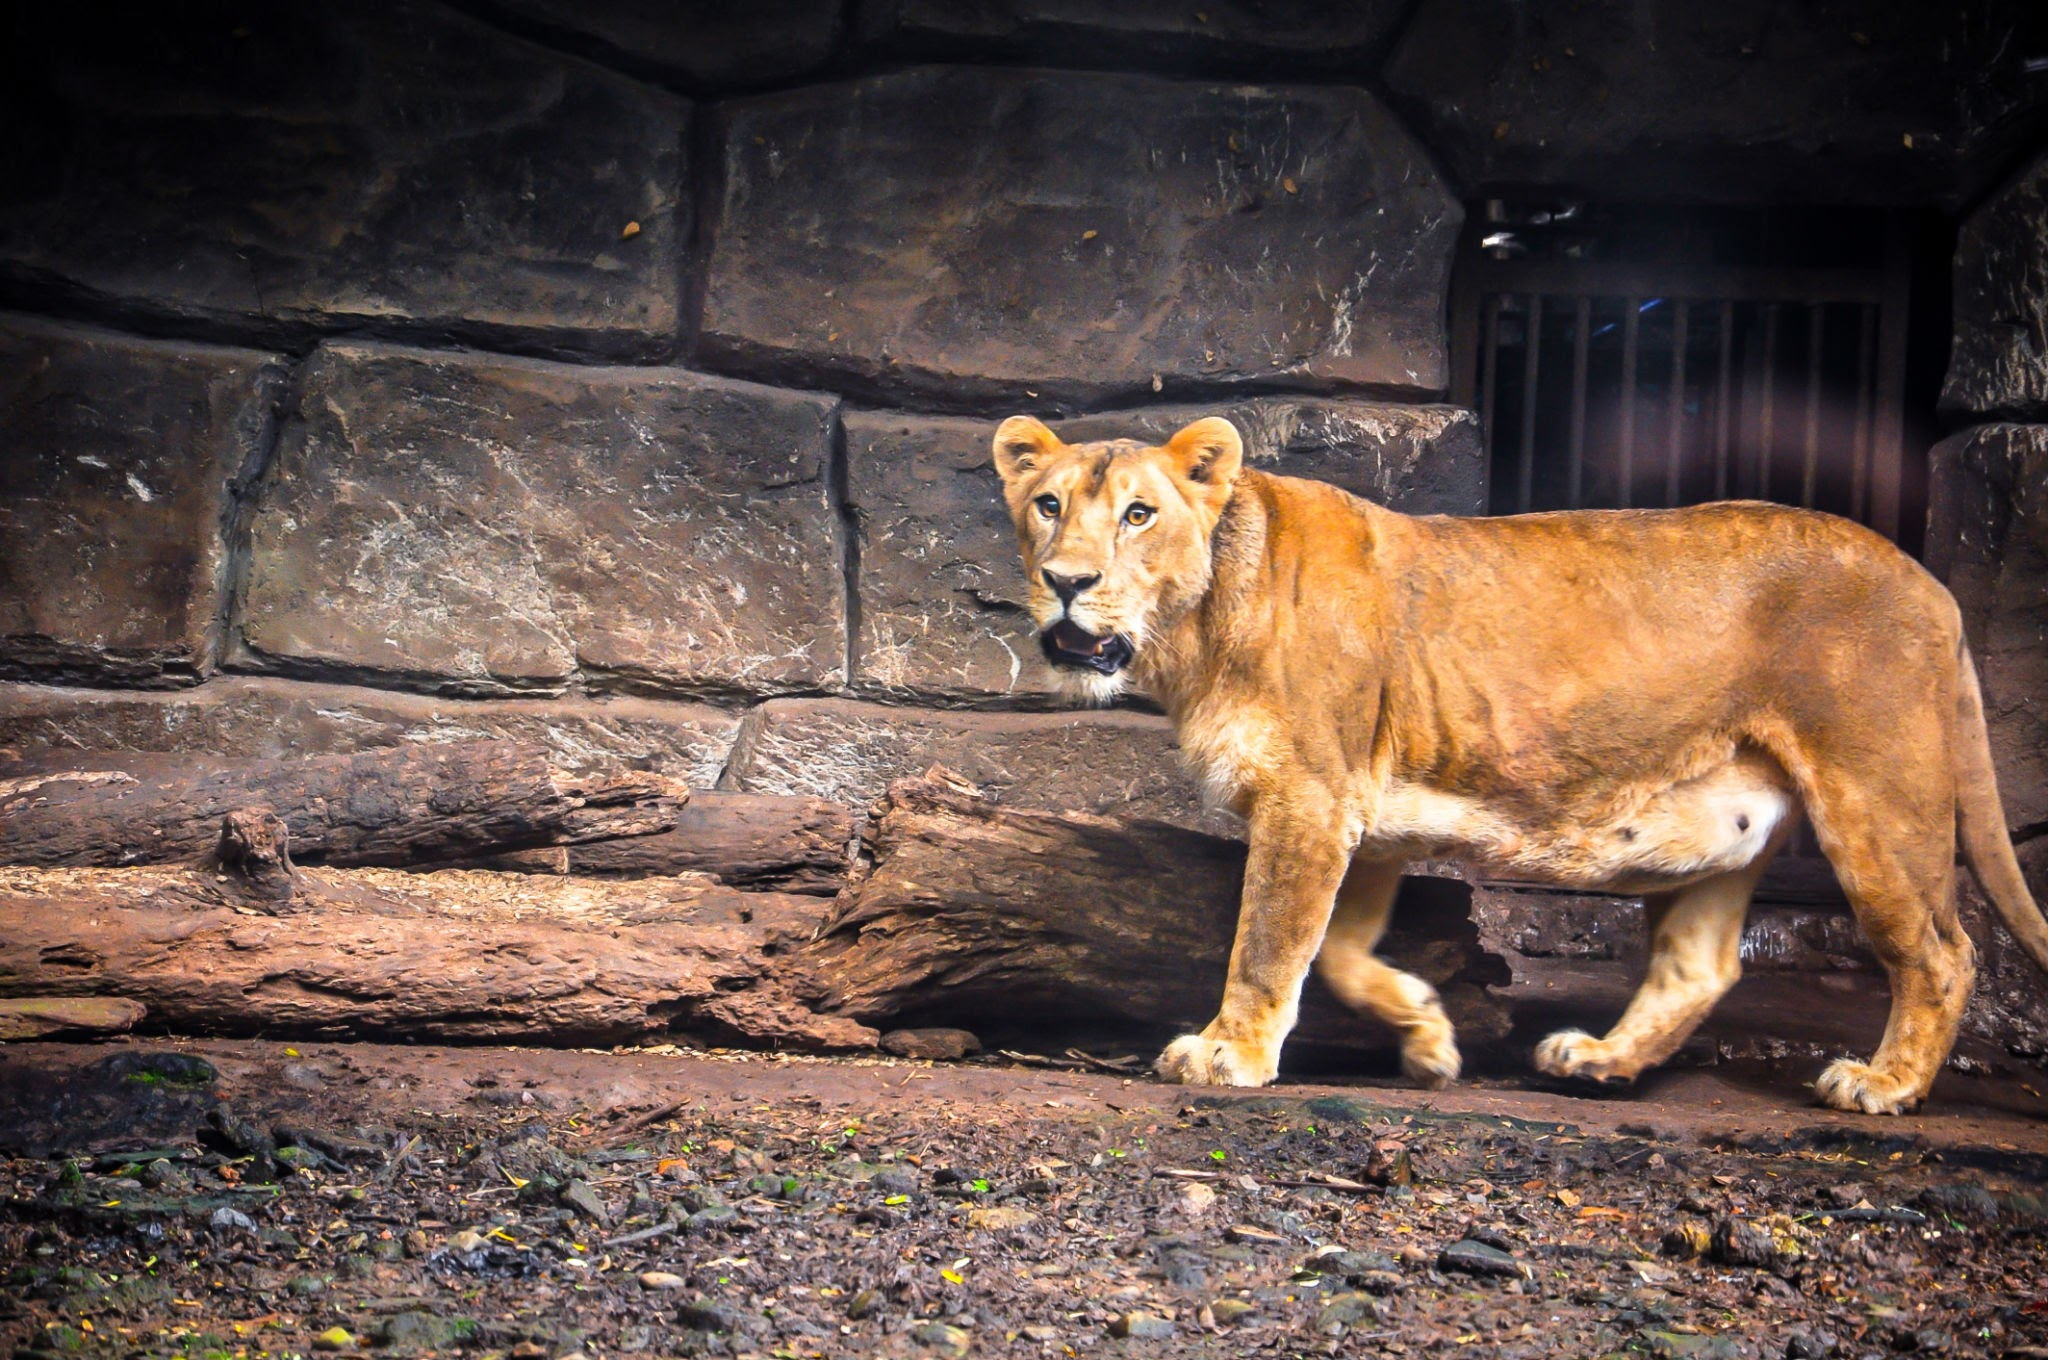 Bandung Zoological Garden